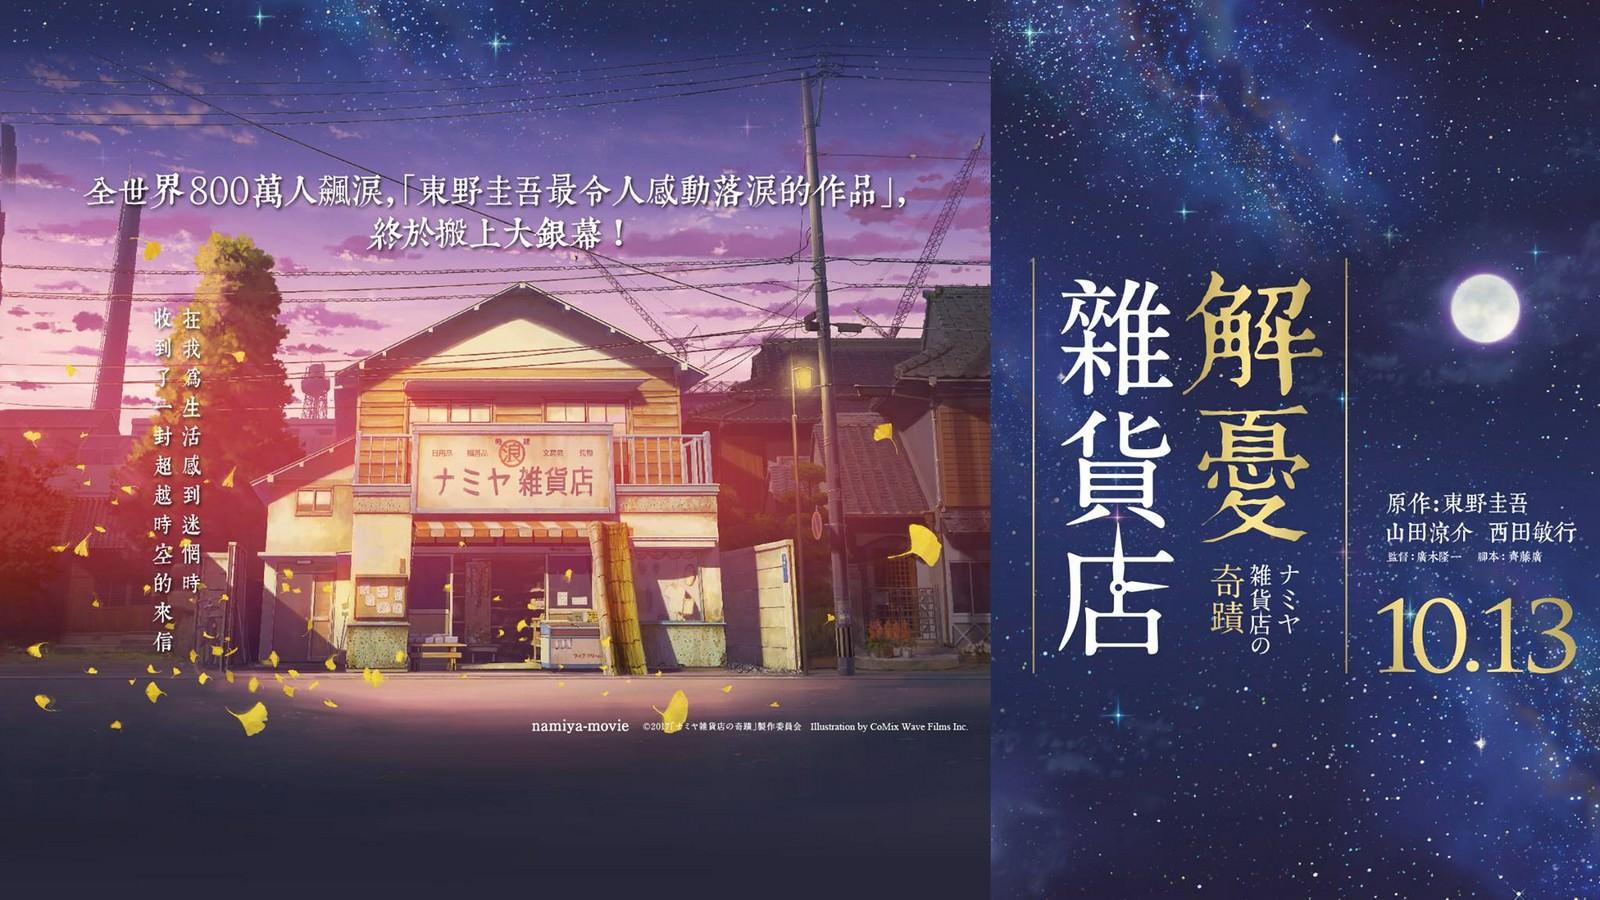 Movie, ナミヤ雑貨店の奇蹟(日本, 2017) / 解憂雜貨店(台灣.香港) / Miracles of the Namiya General Store(英文), 電影海報, 台灣, 橫版